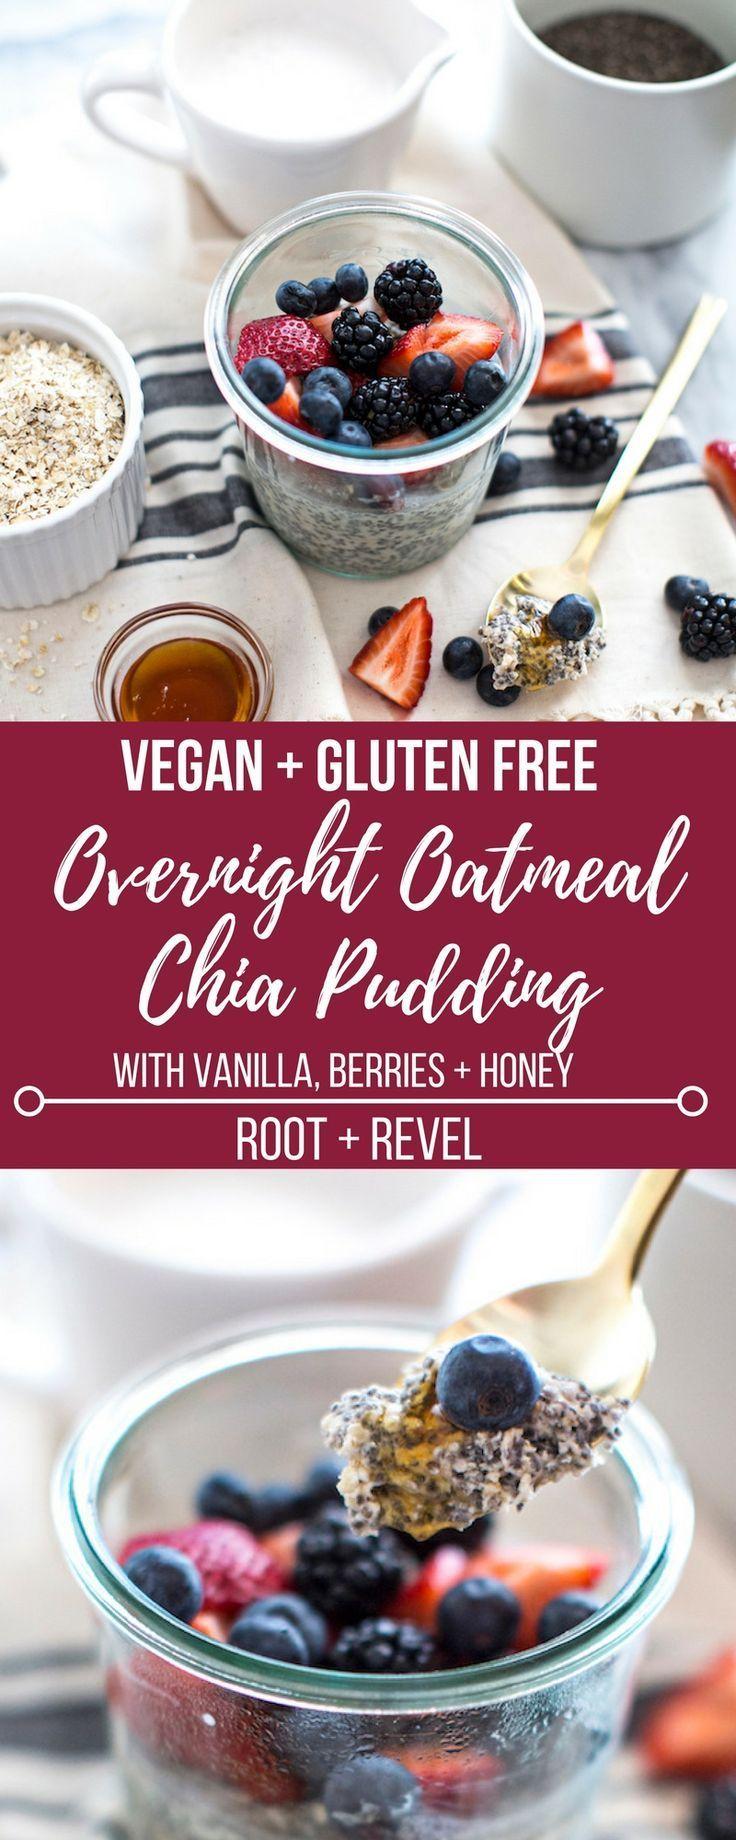 Overnight oatmeal chia pudding with vanilla honey